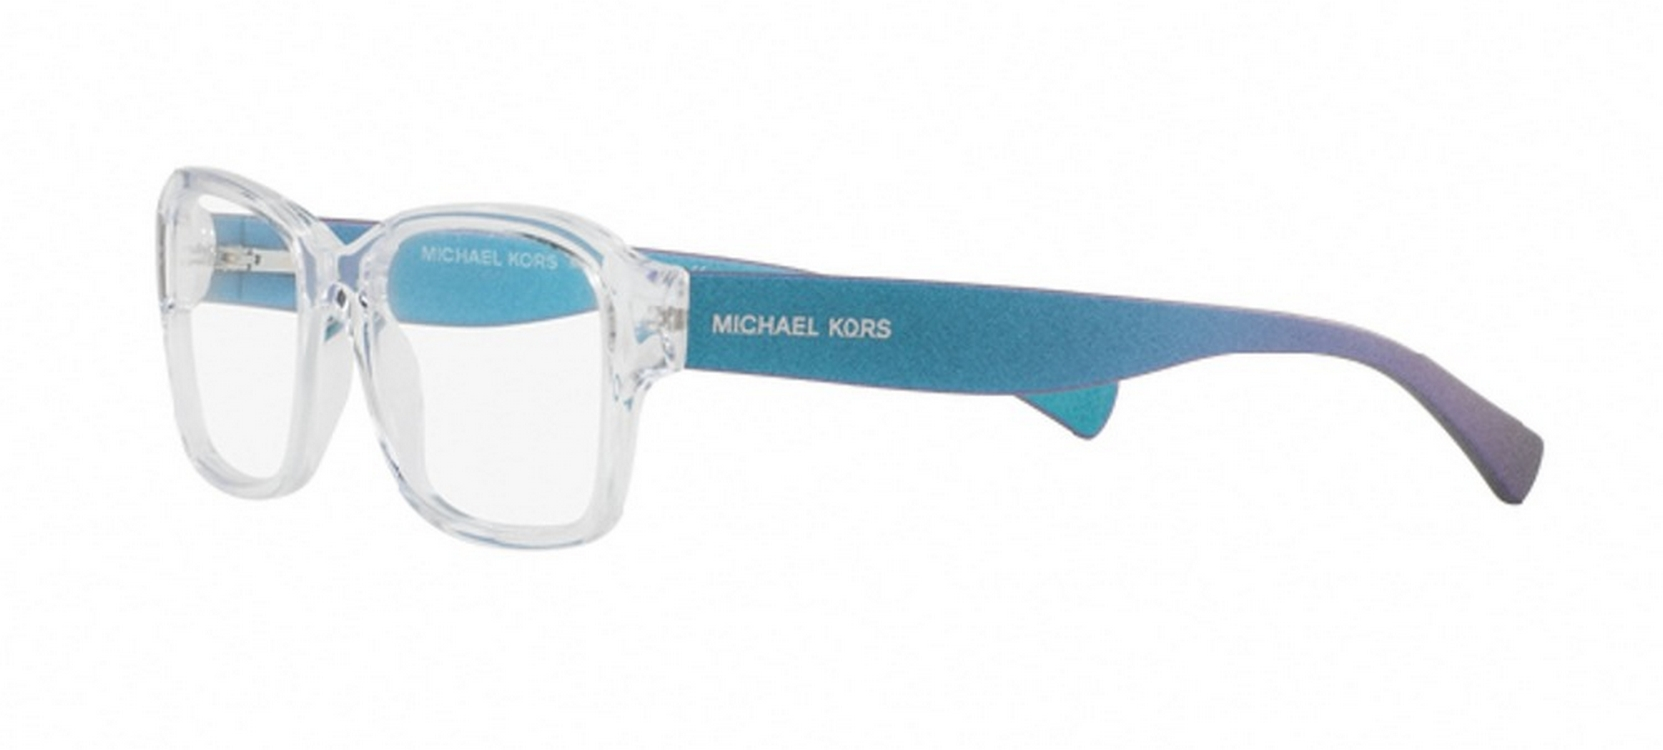 eef15f4bd490d Michael Kors Women s MK4036 3206 52 Rectangle Plastic Clear Clear Eyeglasses  - Walmart.com